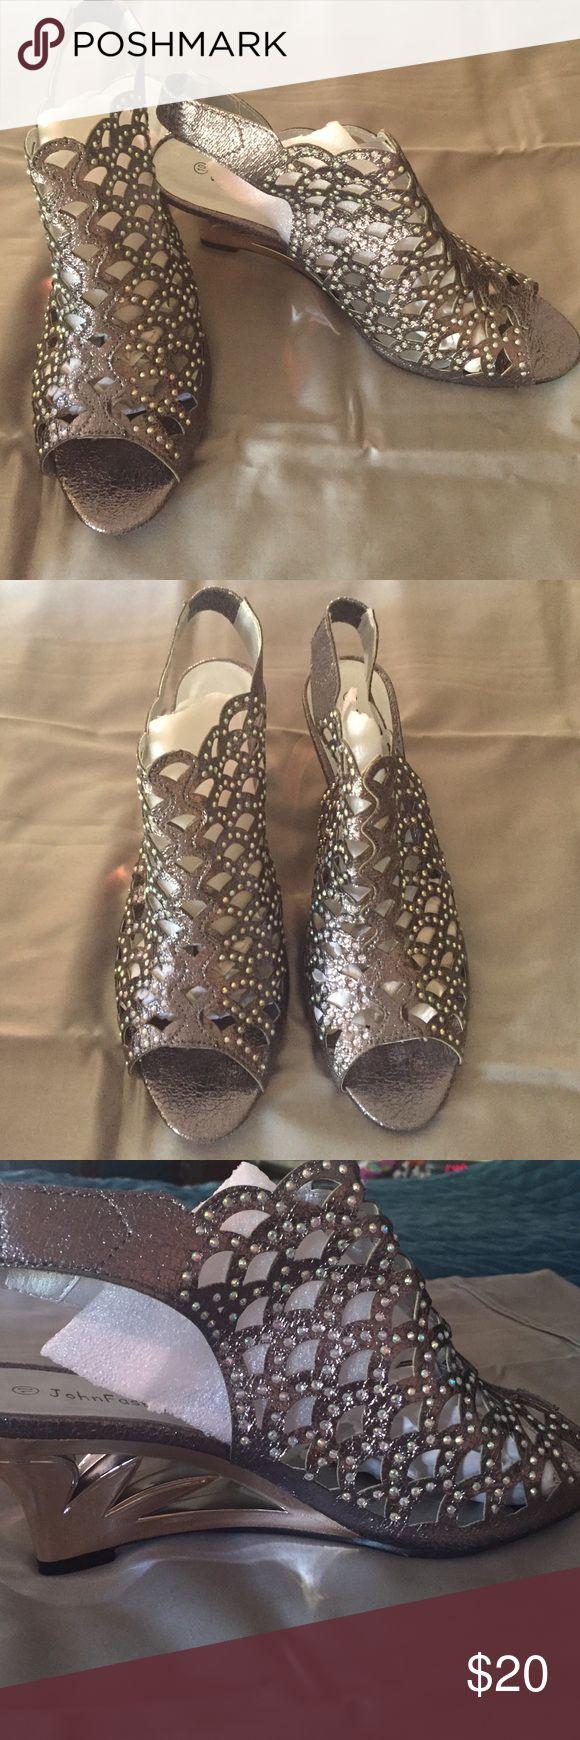 Pewter Sandals New never worn pewter high heel Sandal JohnFashion Shoes Sandals